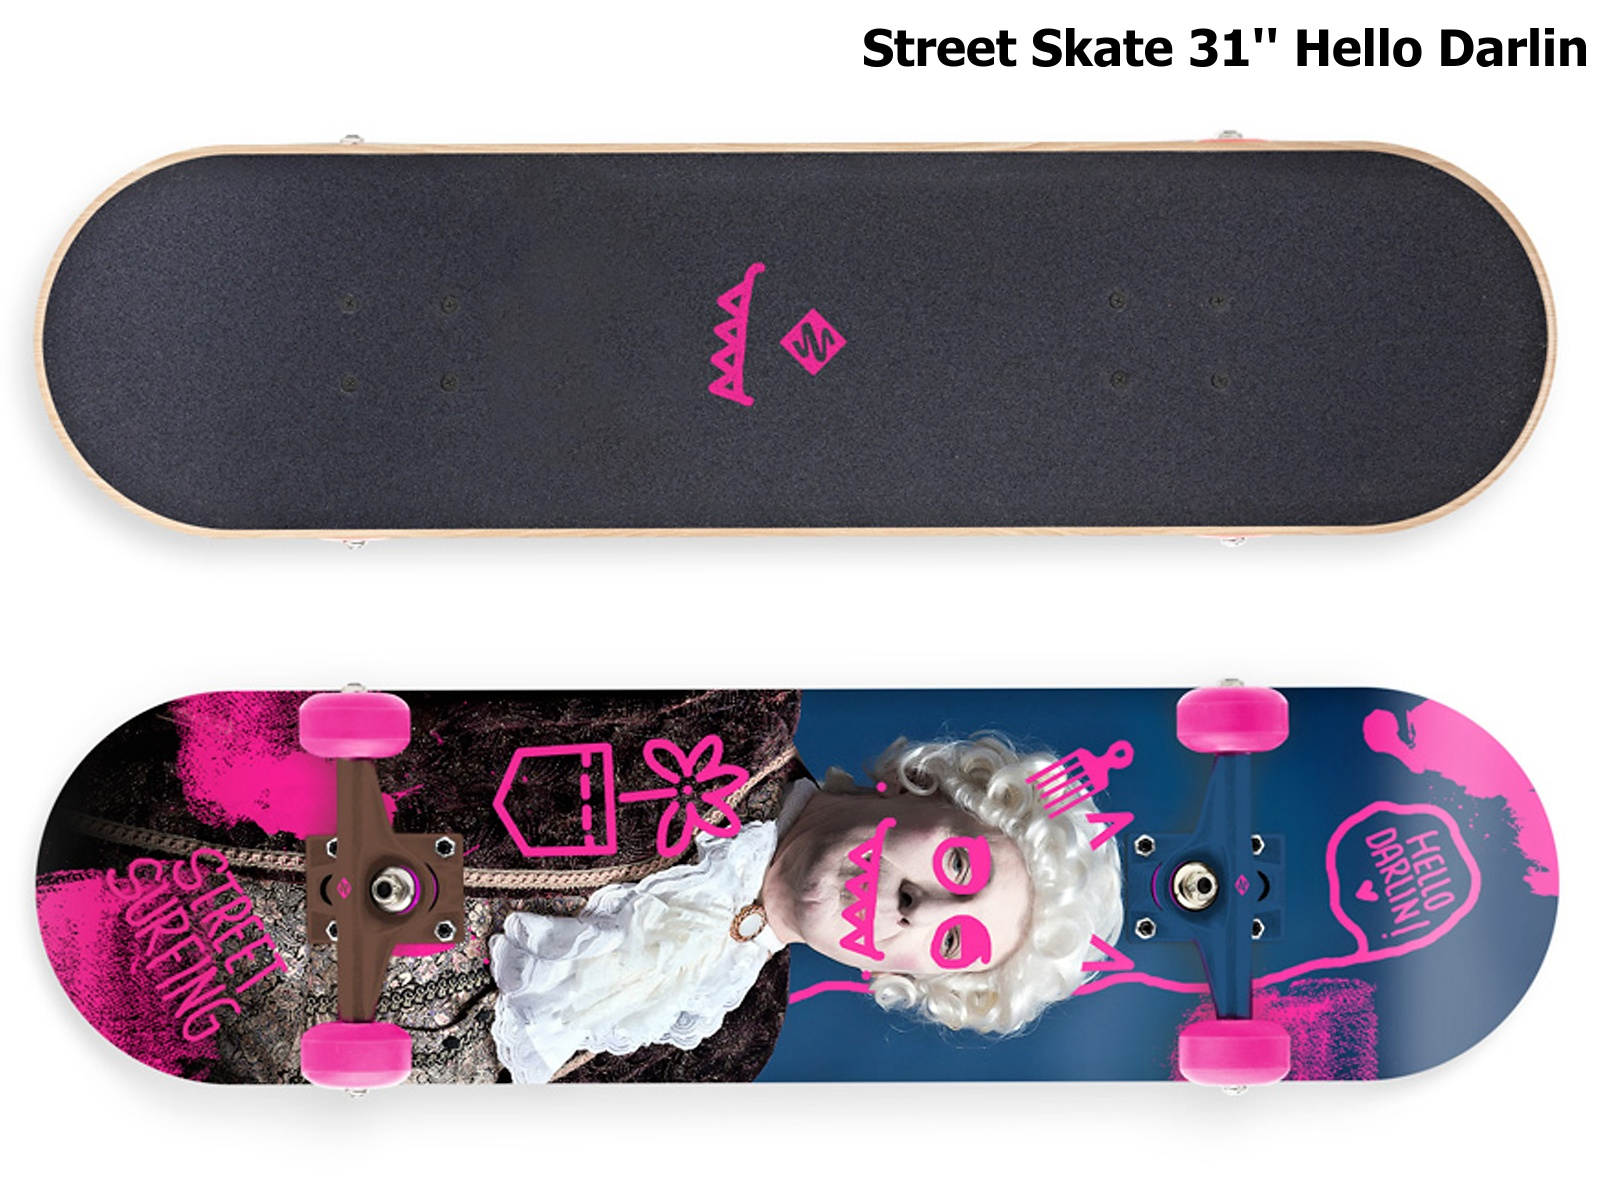 Skateboard STREET SURFING Street Skate 31'' Hello Darlin